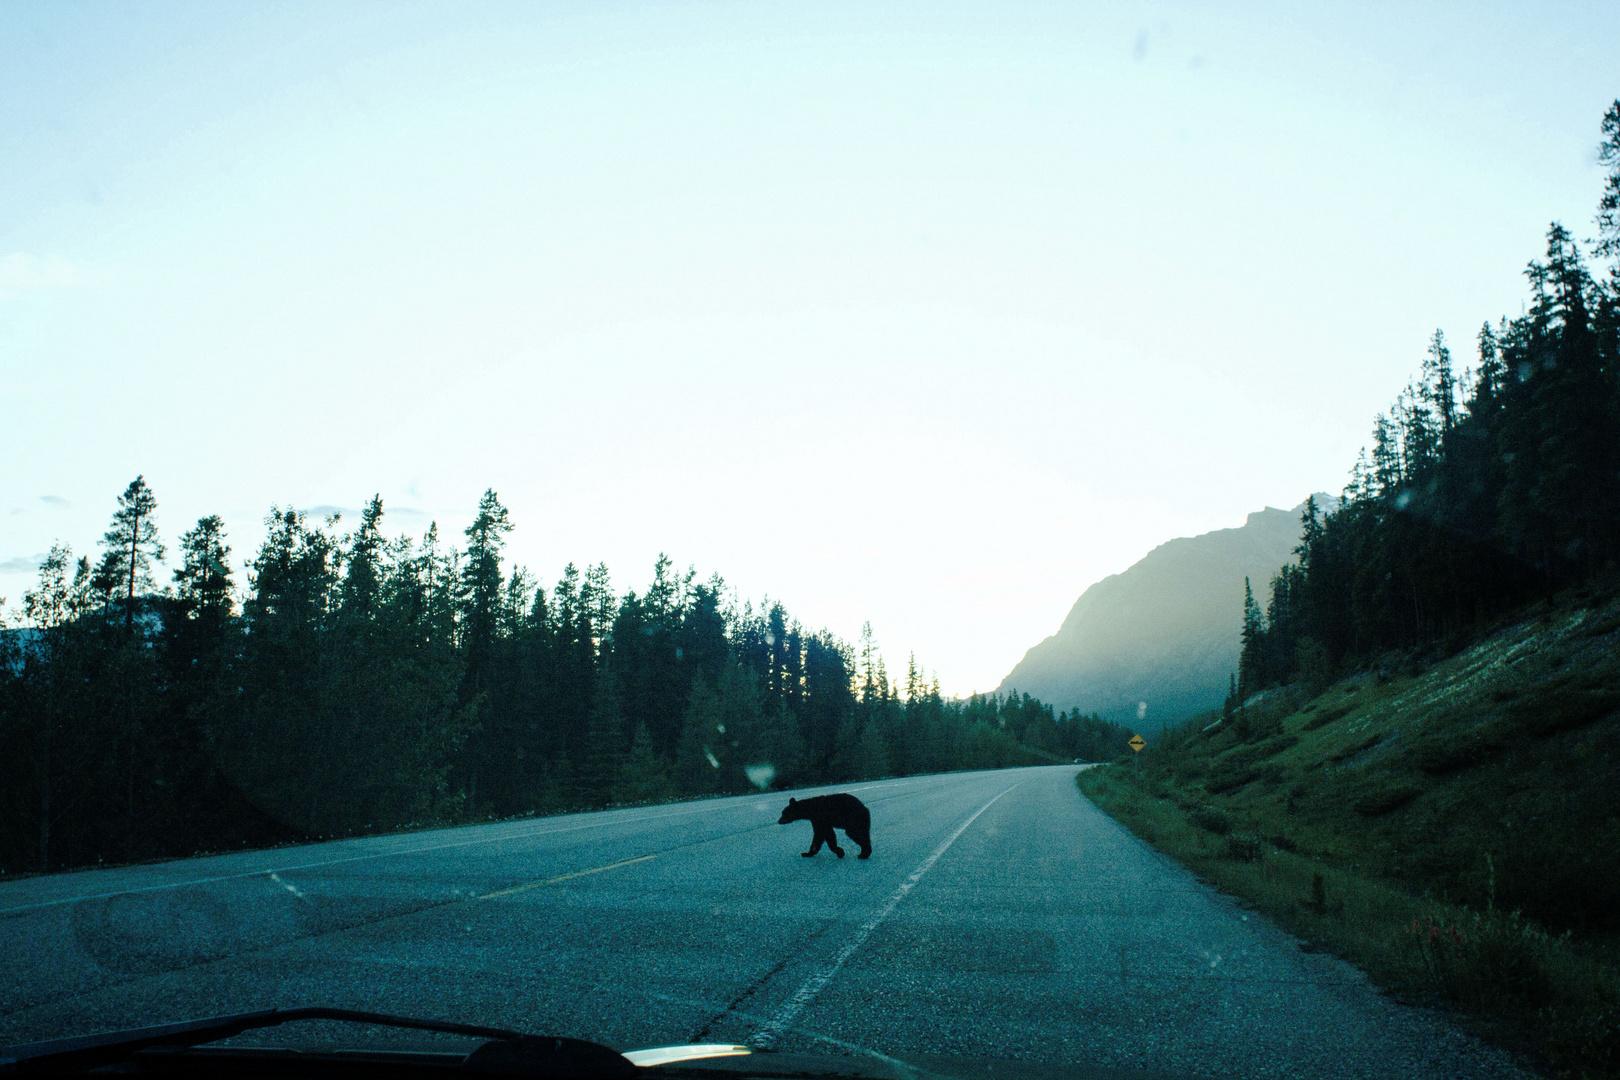 Black Bear Crossing Road